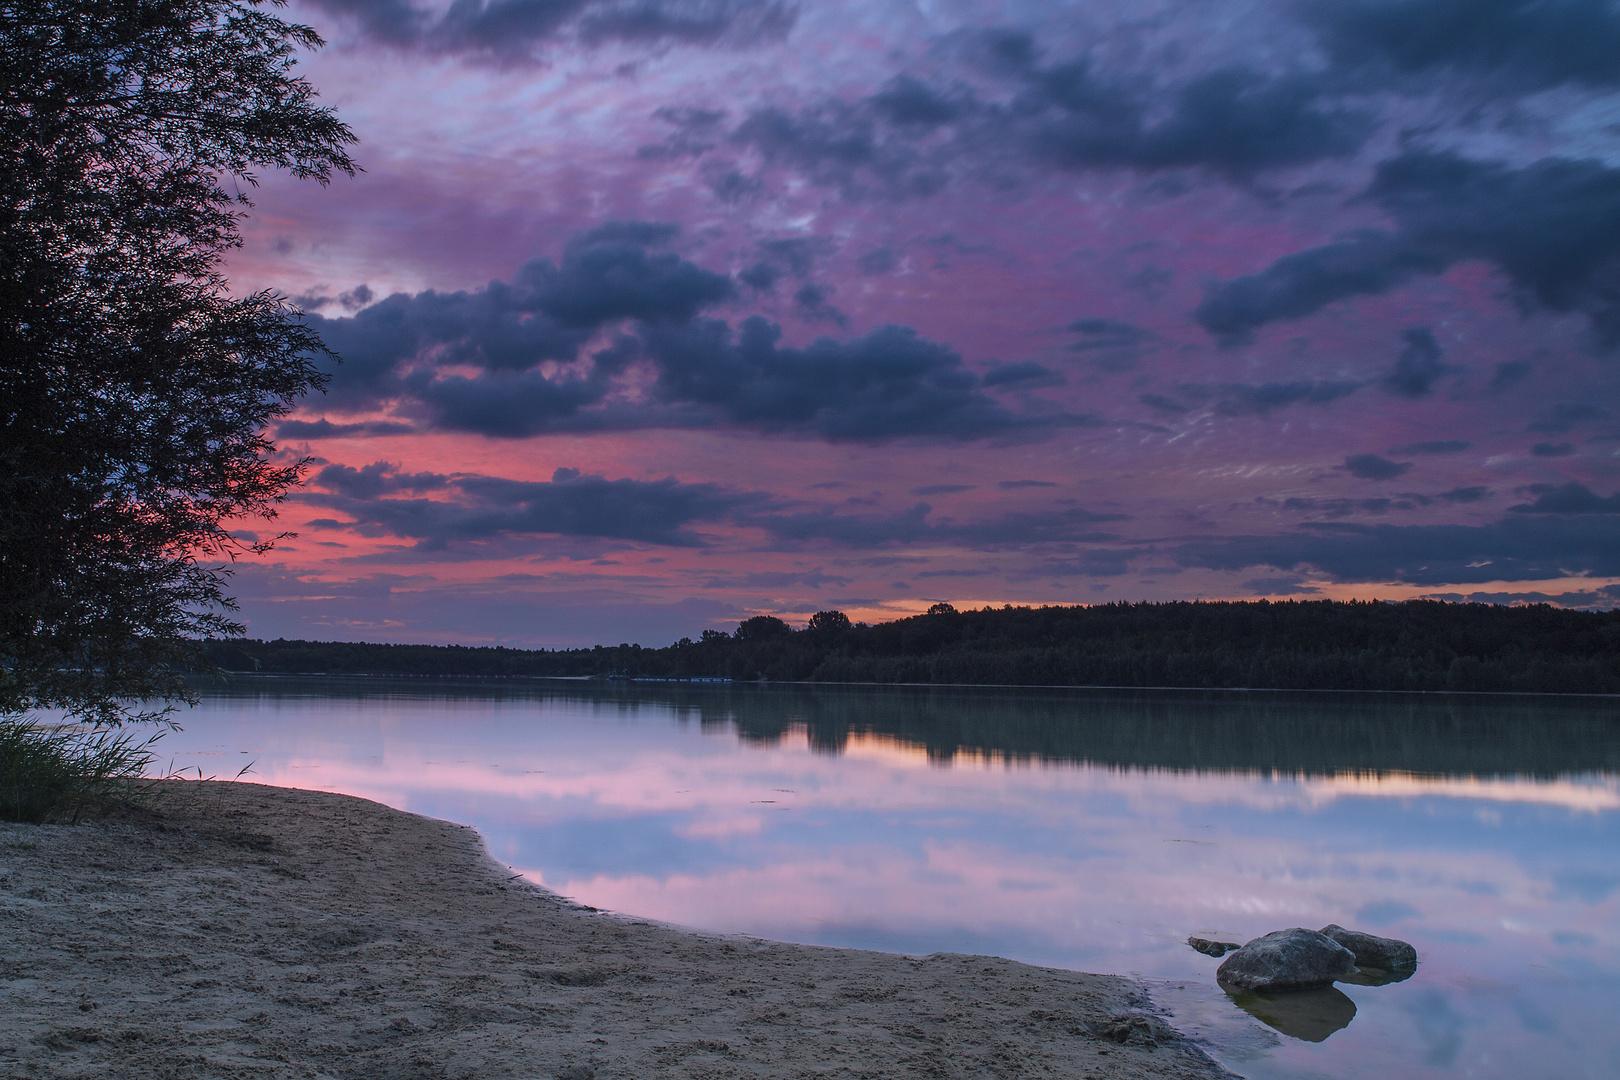 Vor Sonnenaufgang am Baggersee